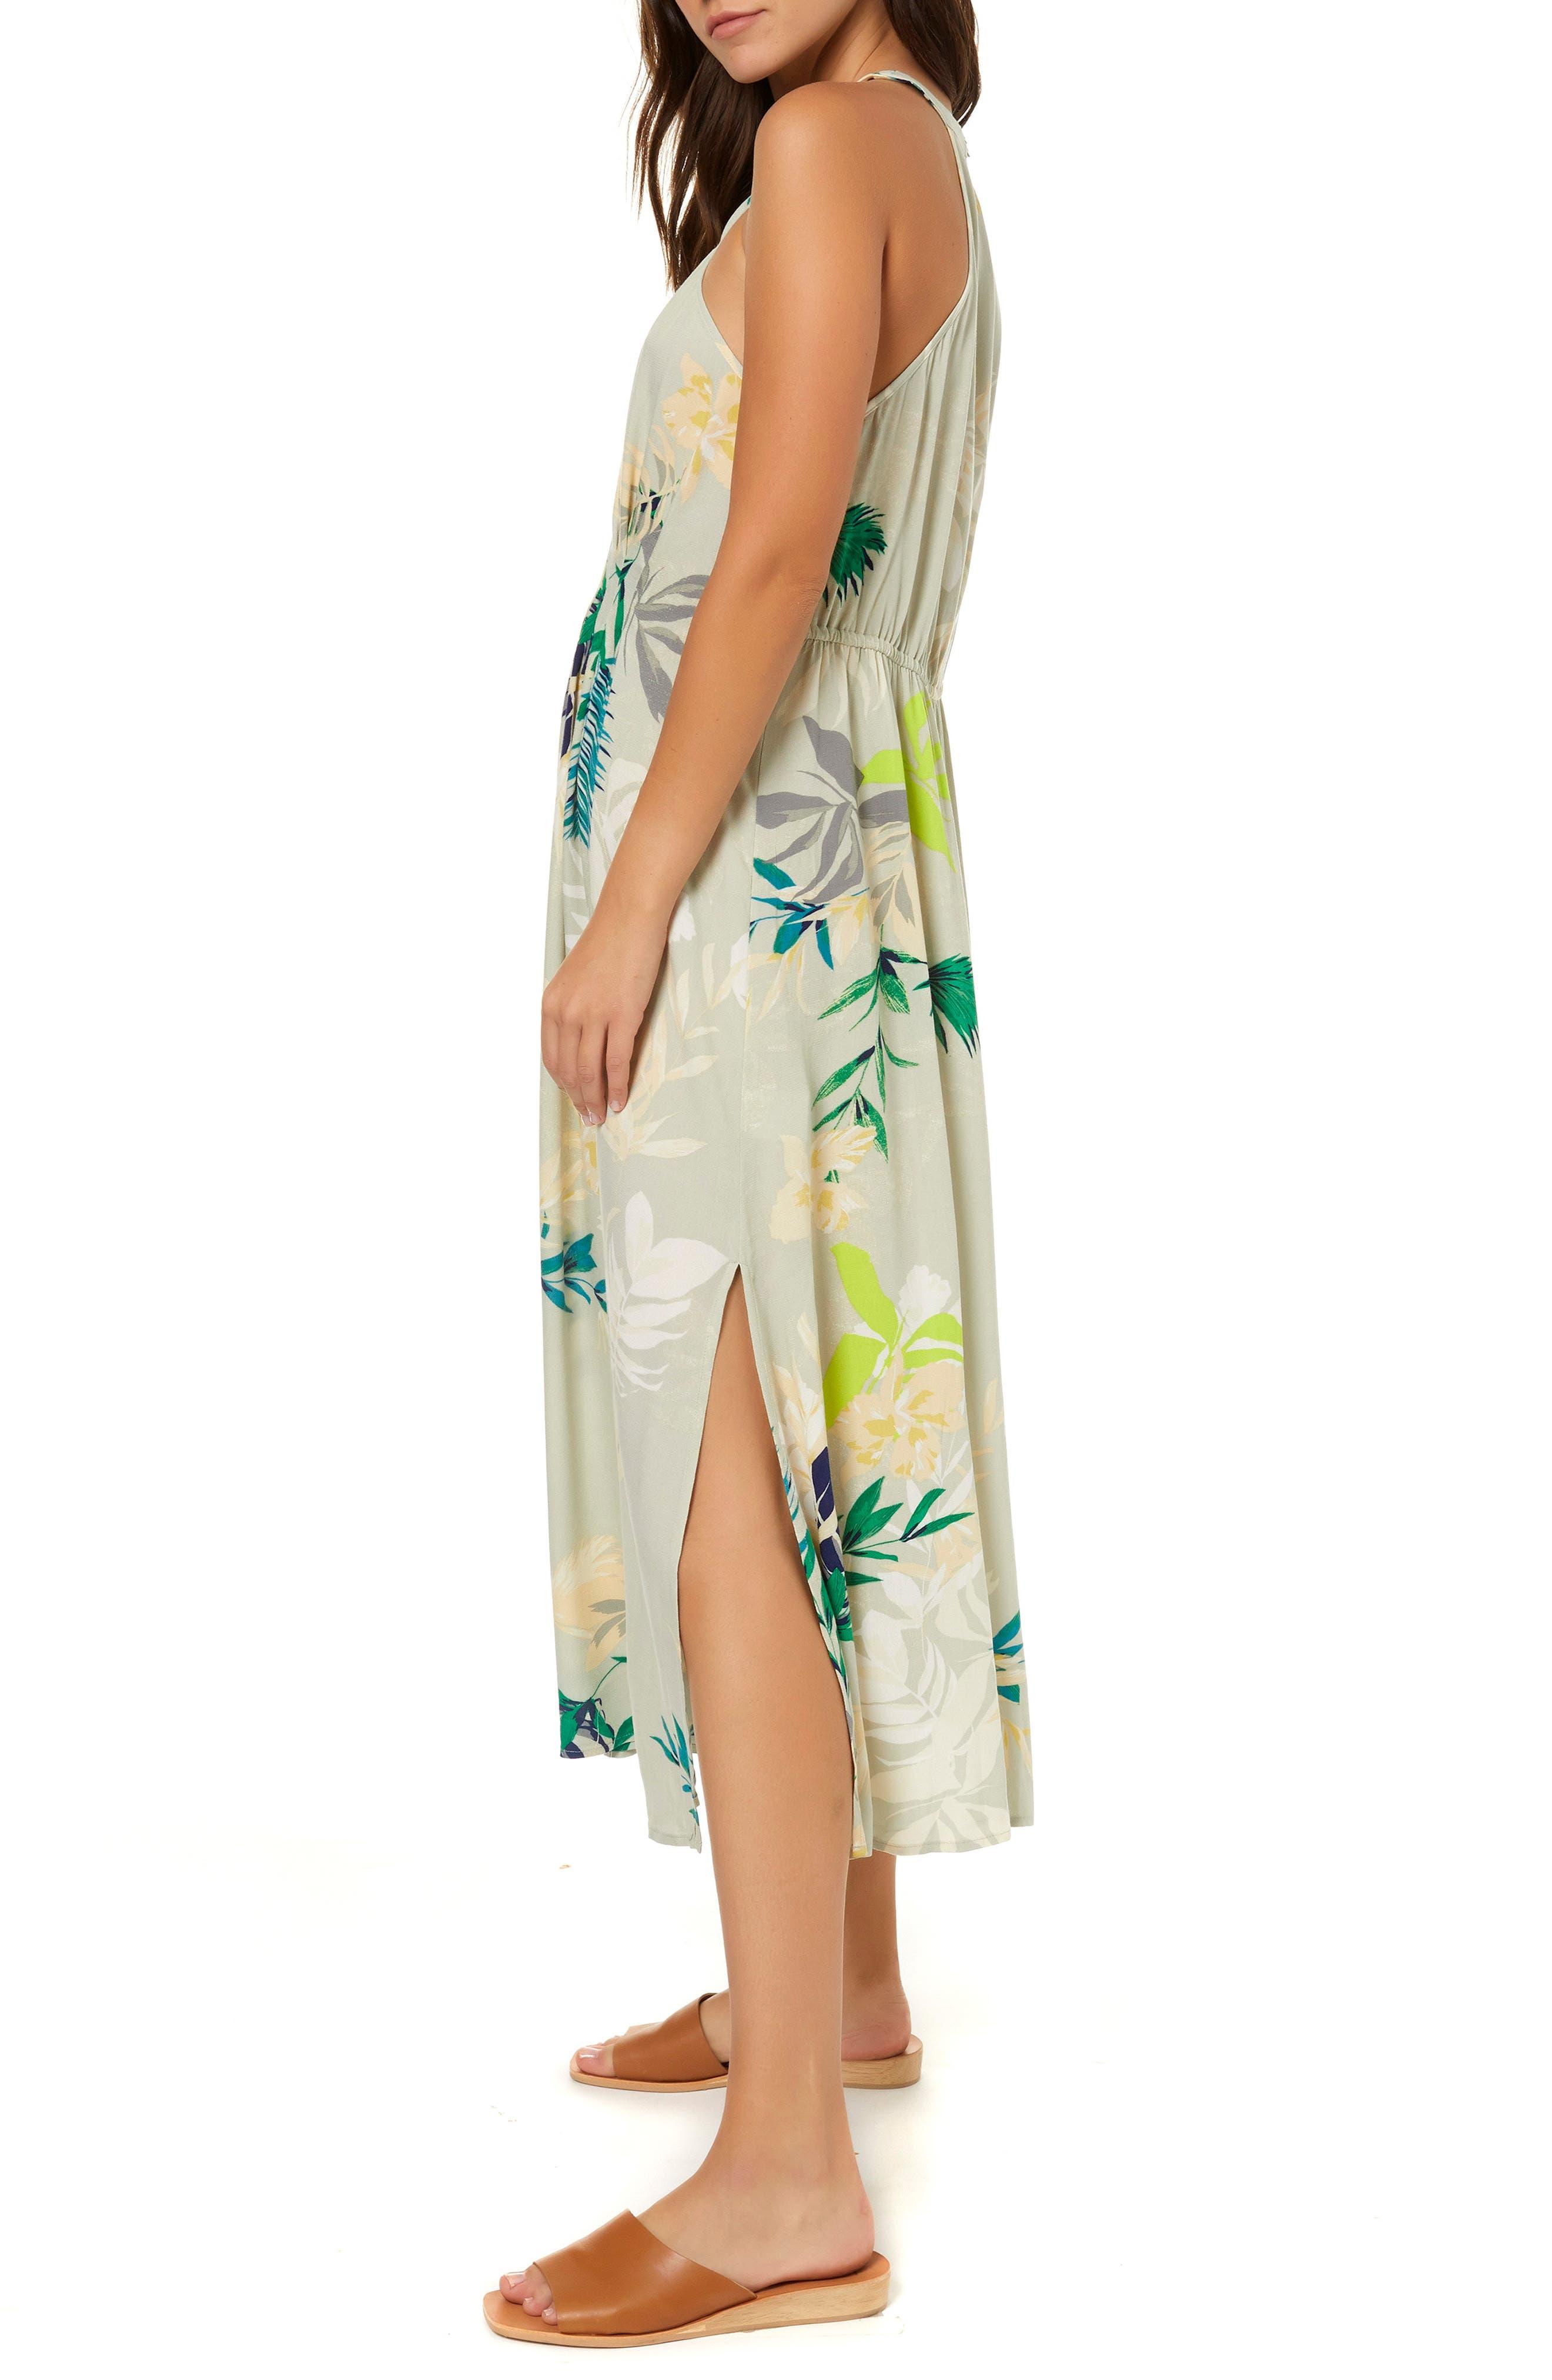 Byronne Floral Print Woven Midi Dress,                             Alternate thumbnail 3, color,                             MULTI COLORED